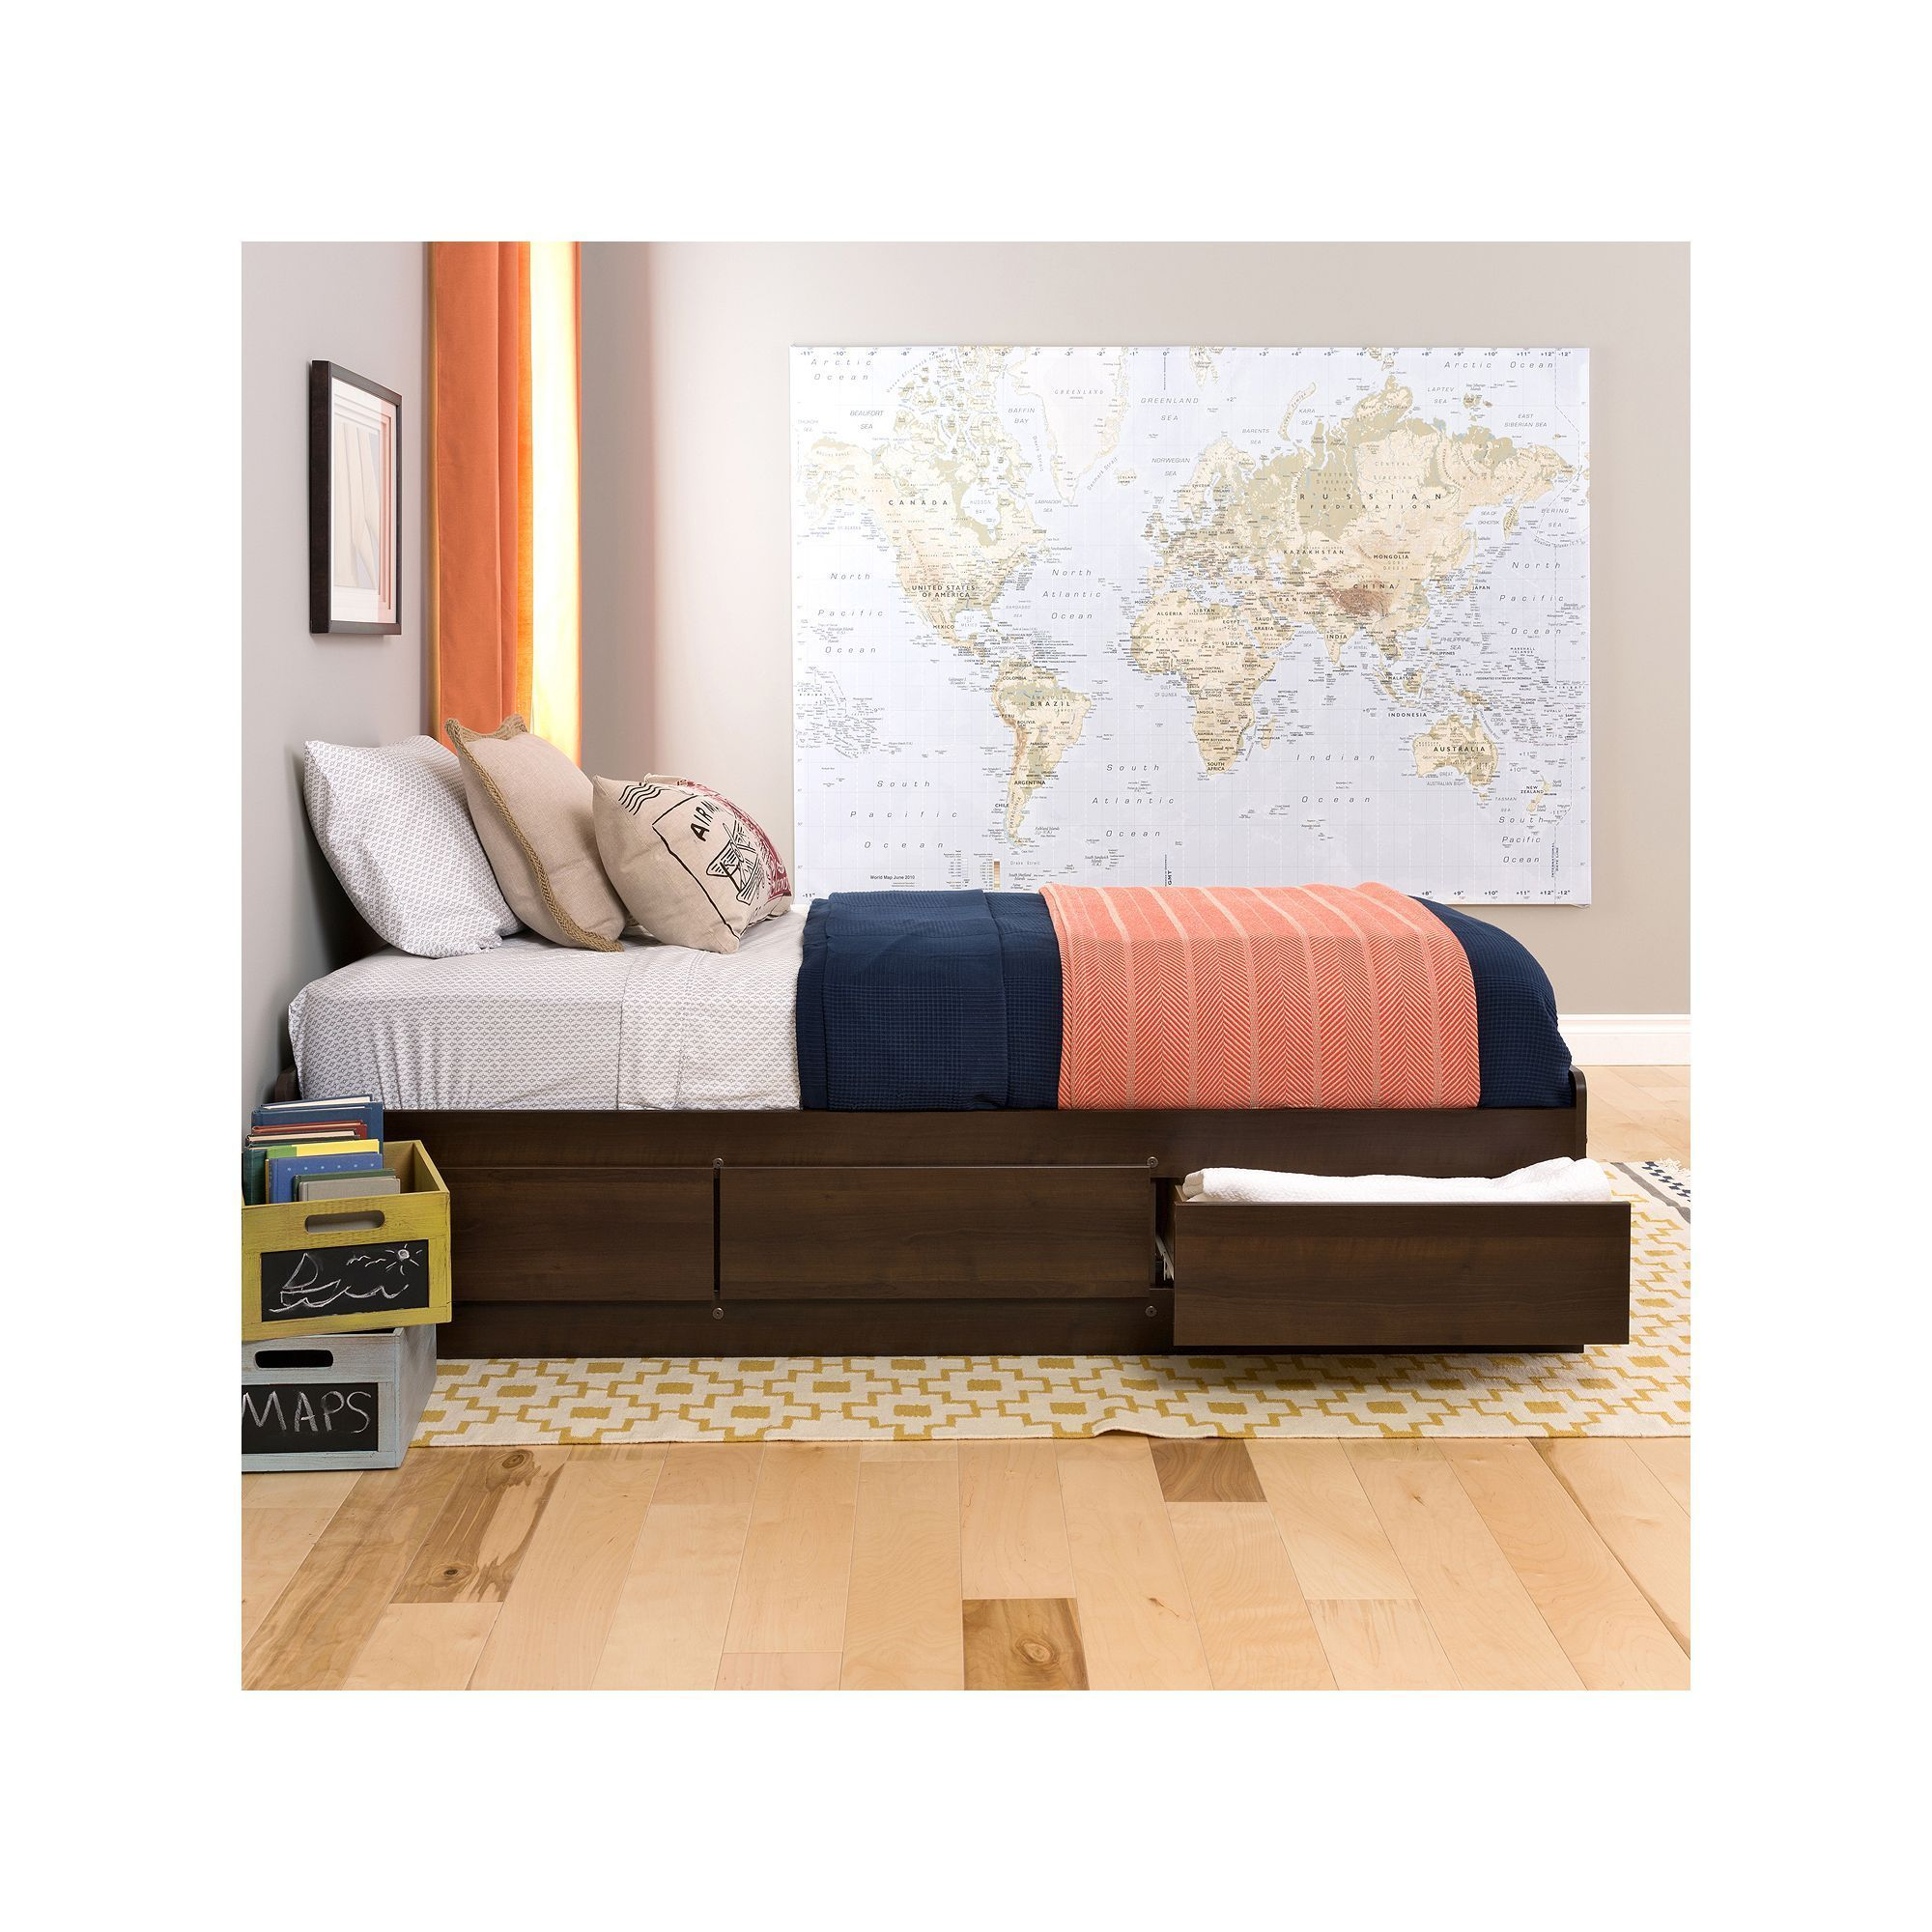 Prepac Twin Platform Storage Bed, Brown Platform bed